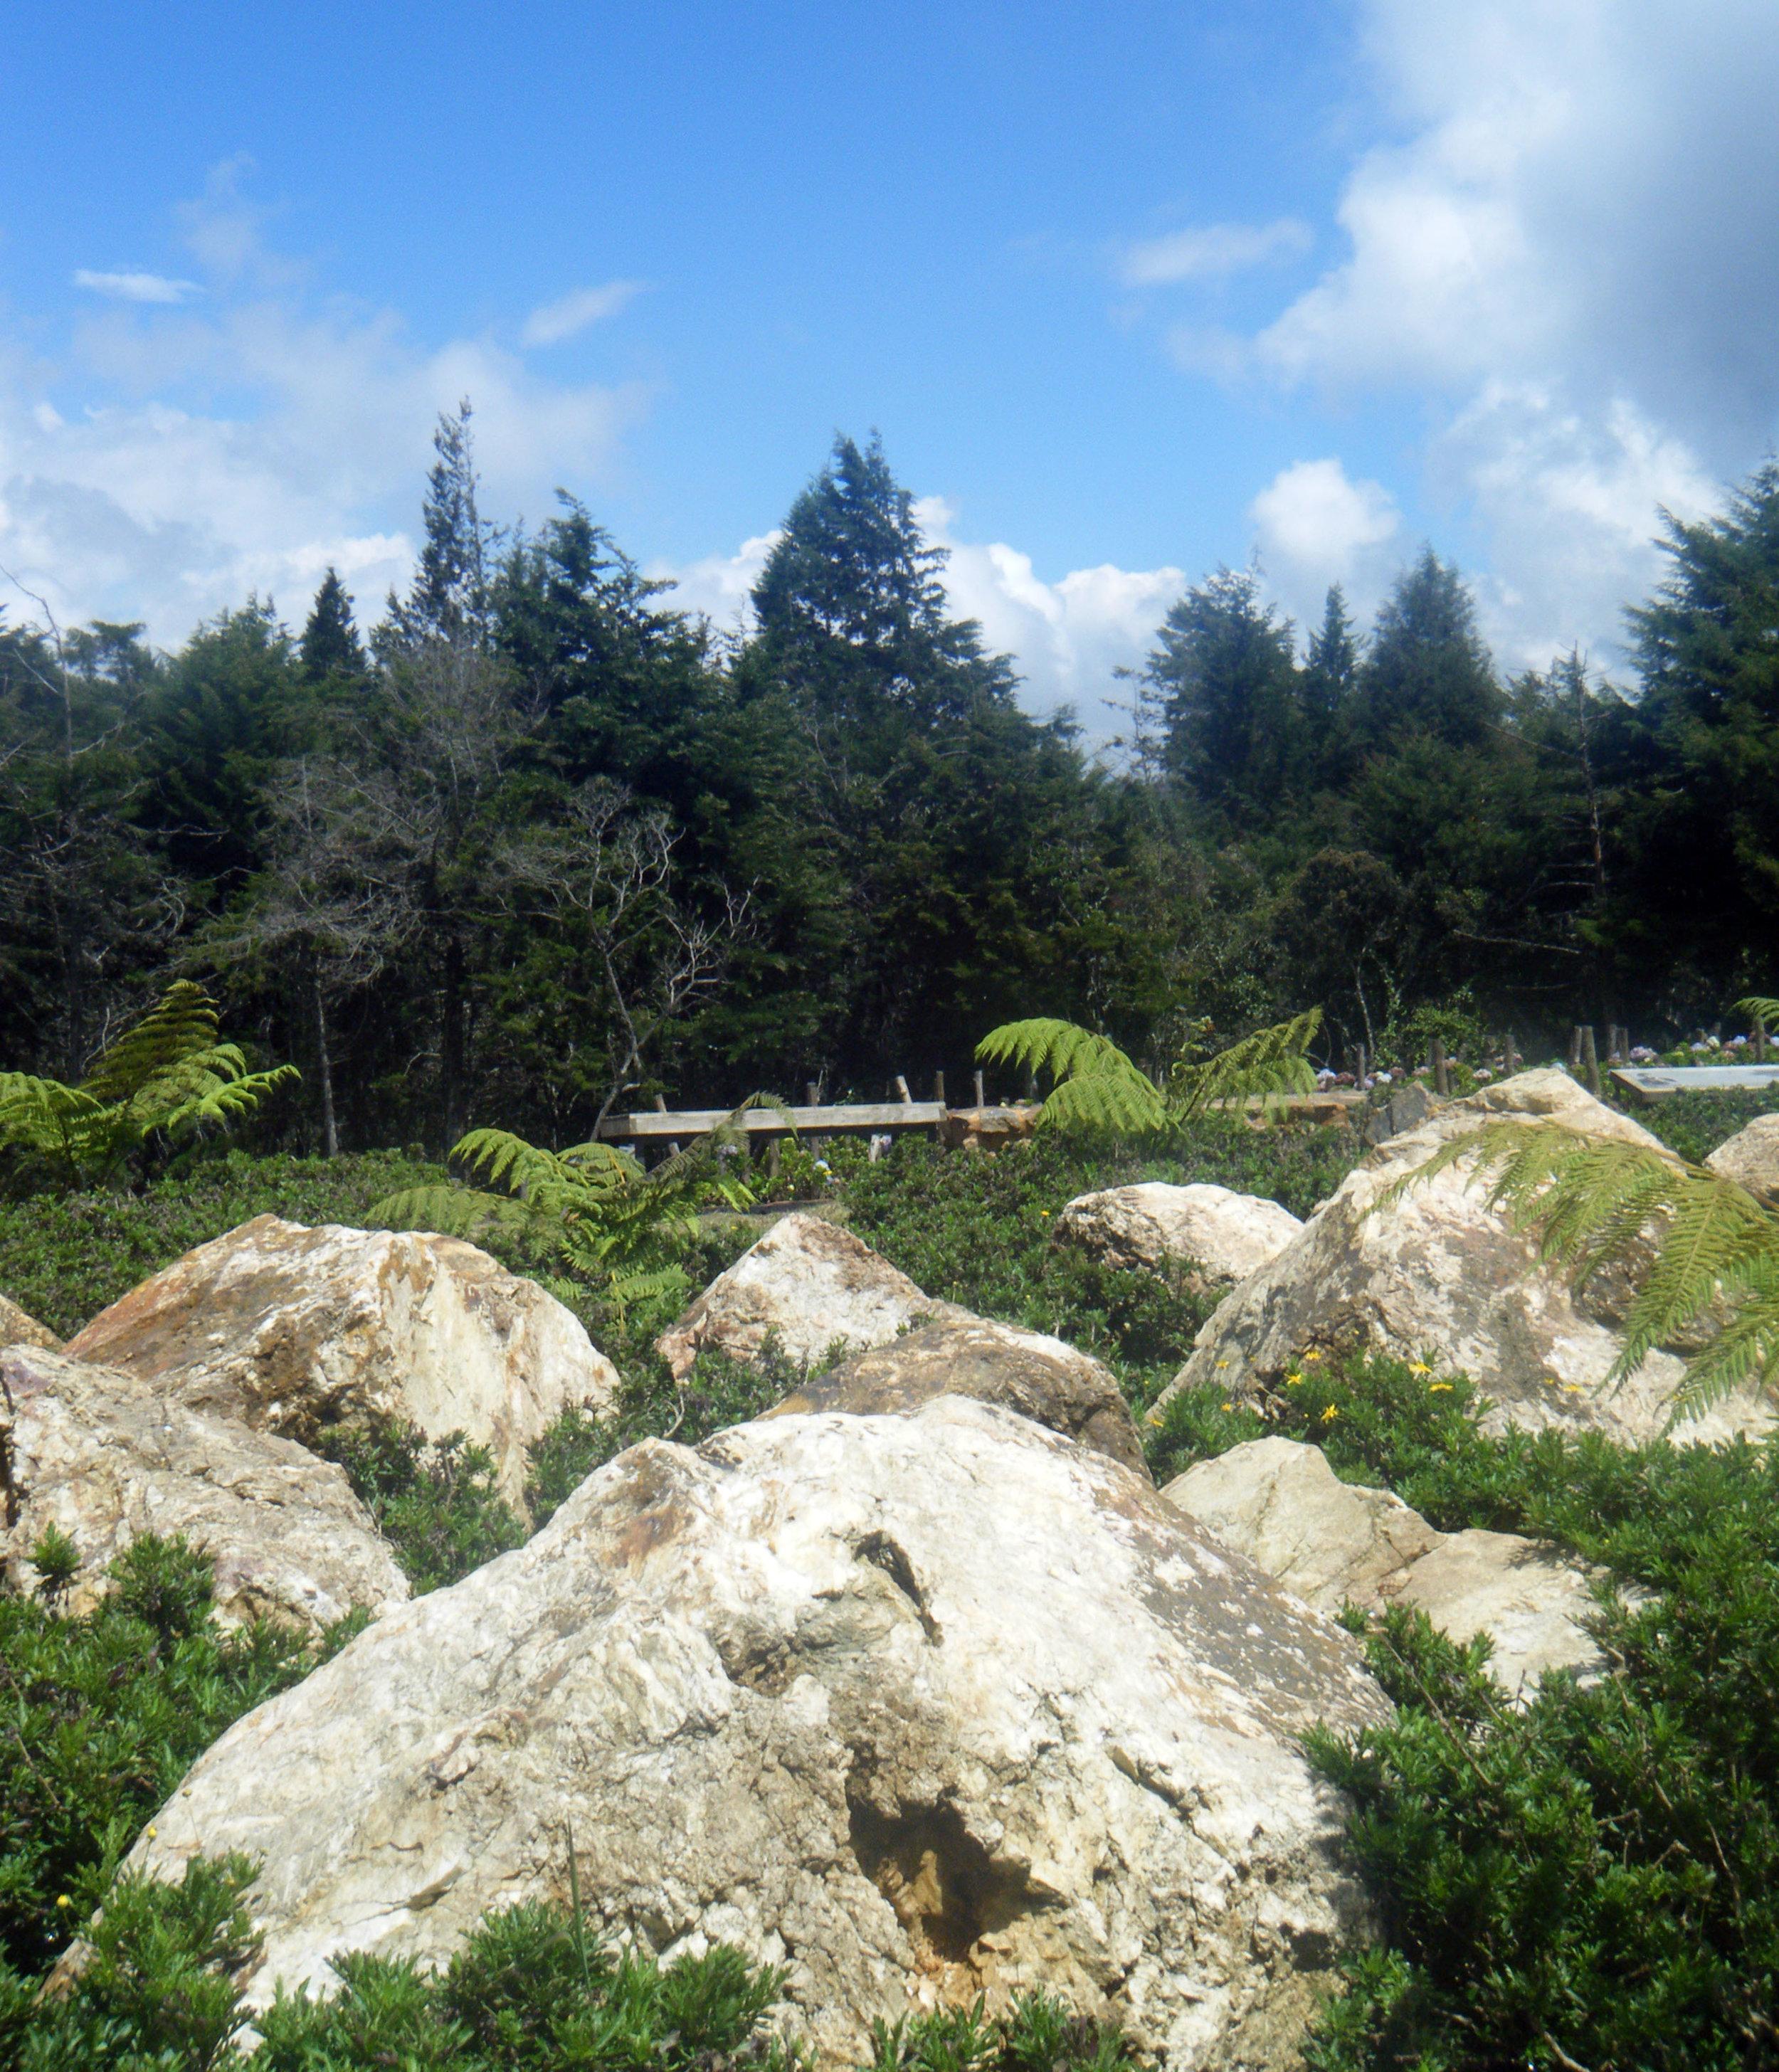 Parque Arvi 10-20-12.jpg